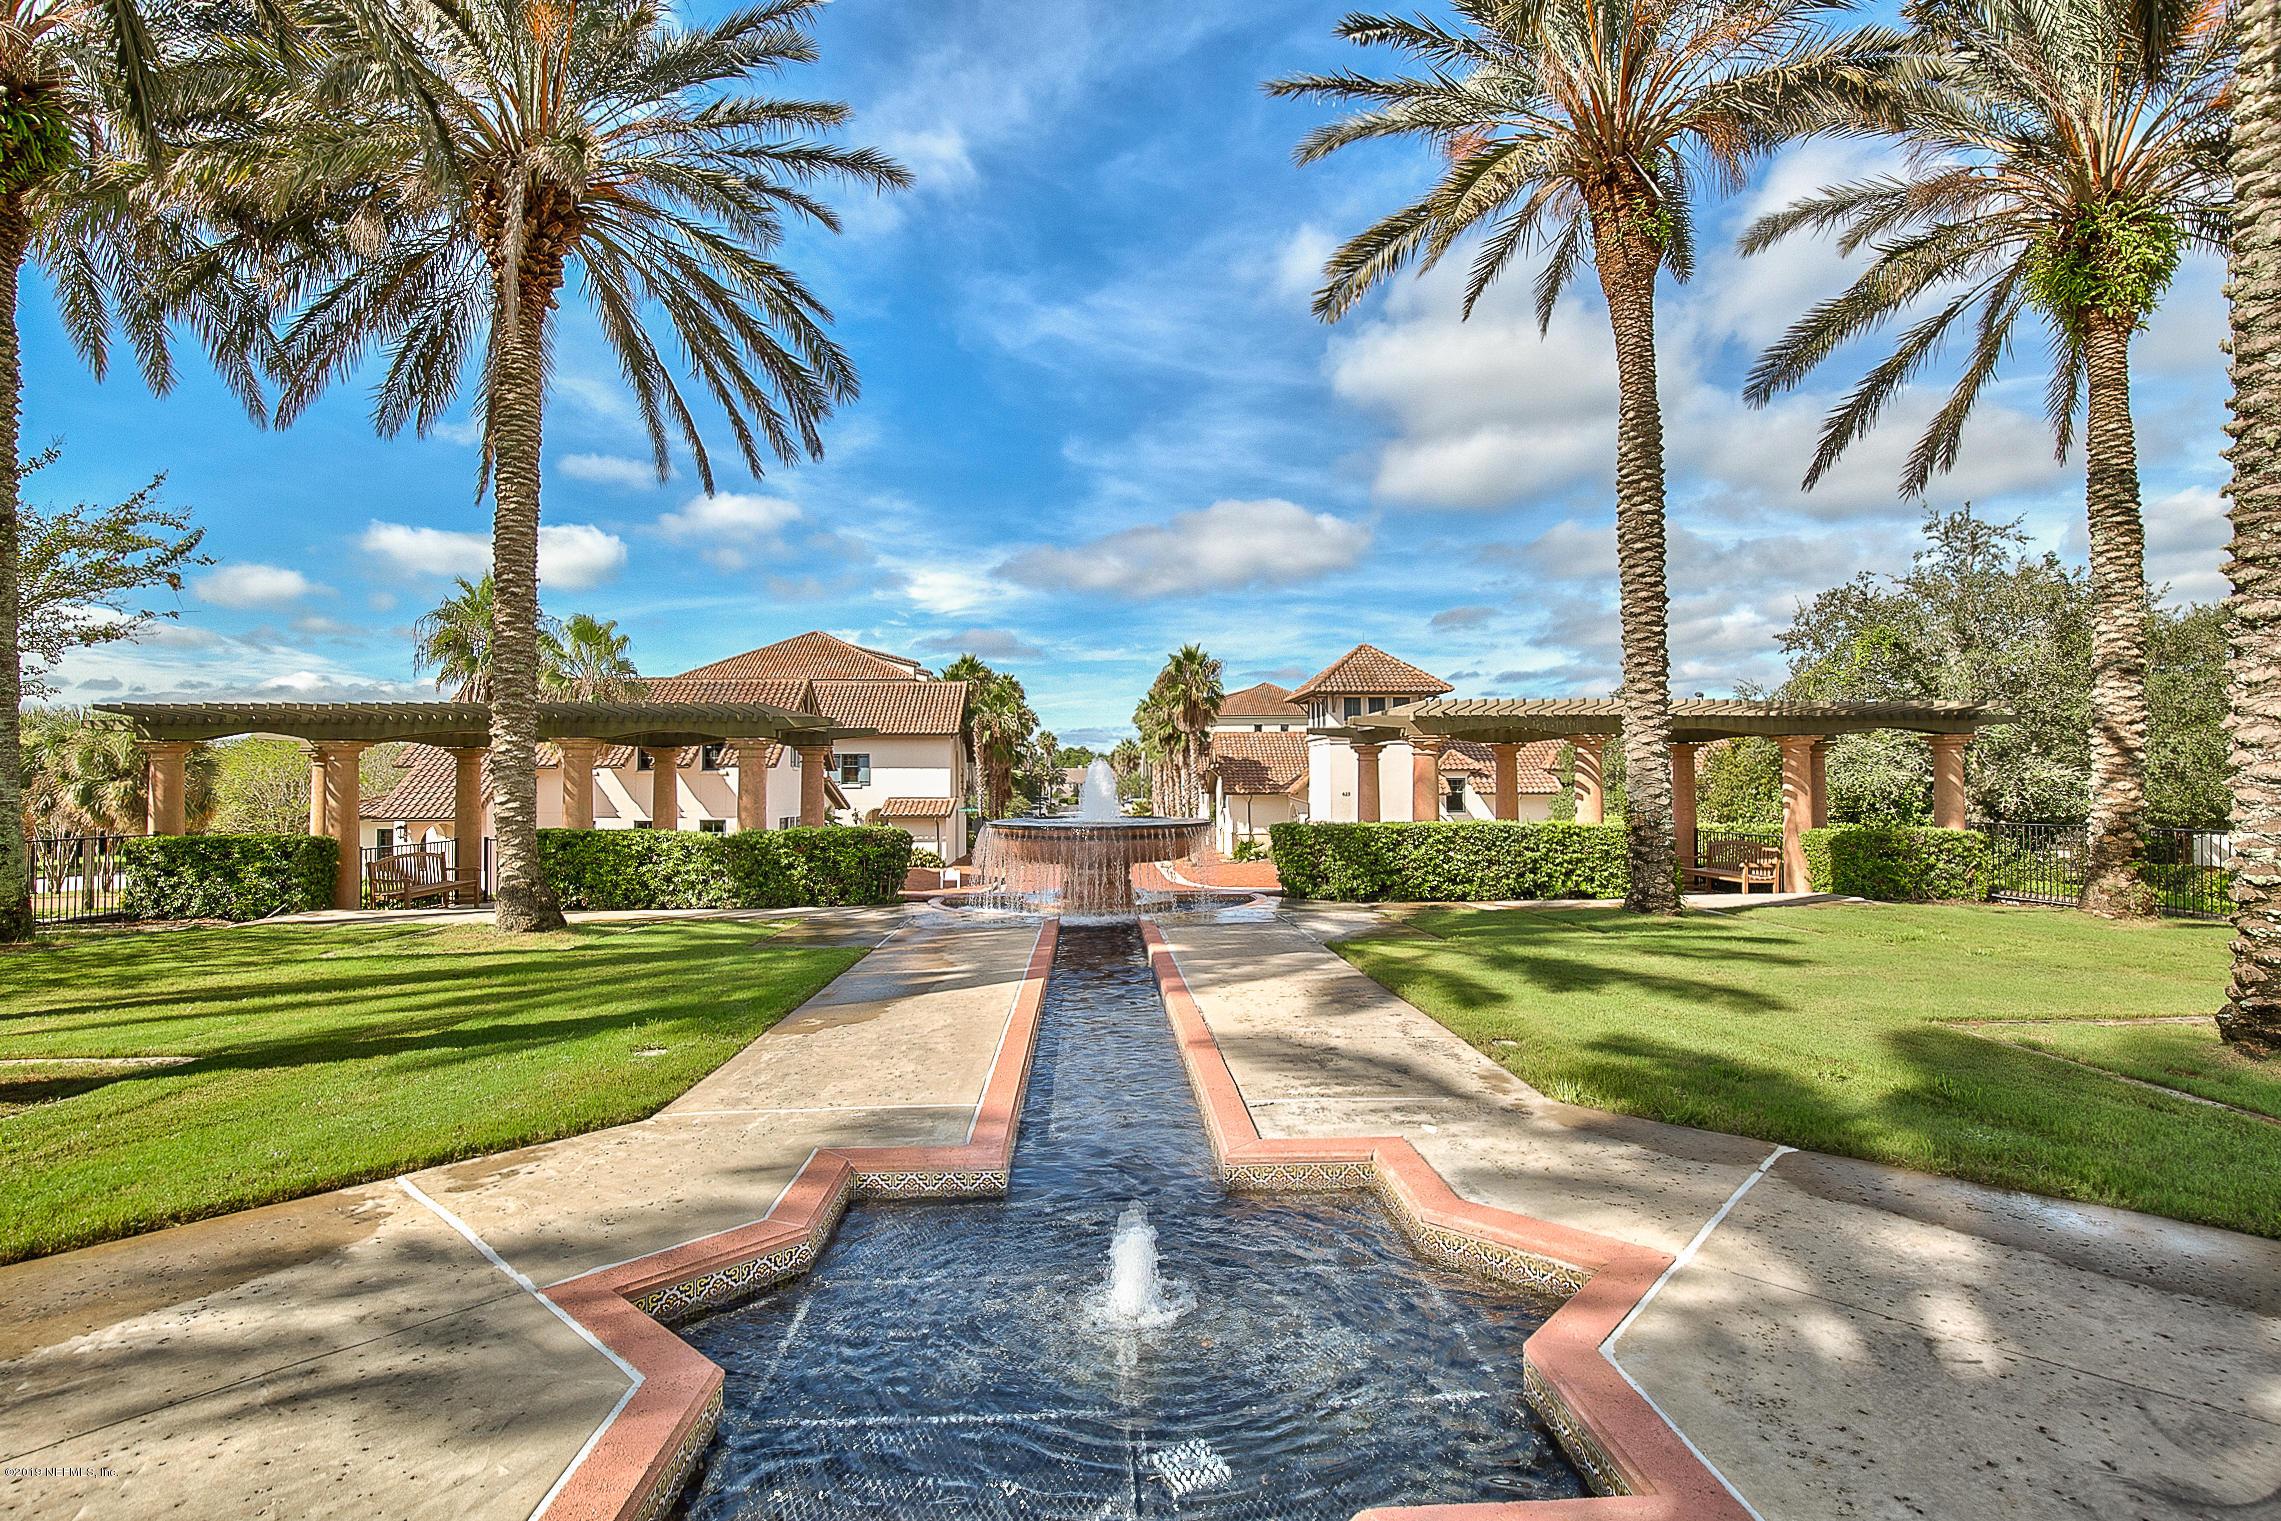 51 CEJA, ST AUGUSTINE, FLORIDA 32095, 3 Bedrooms Bedrooms, ,2 BathroomsBathrooms,Residential - single family,For sale,CEJA,1004687